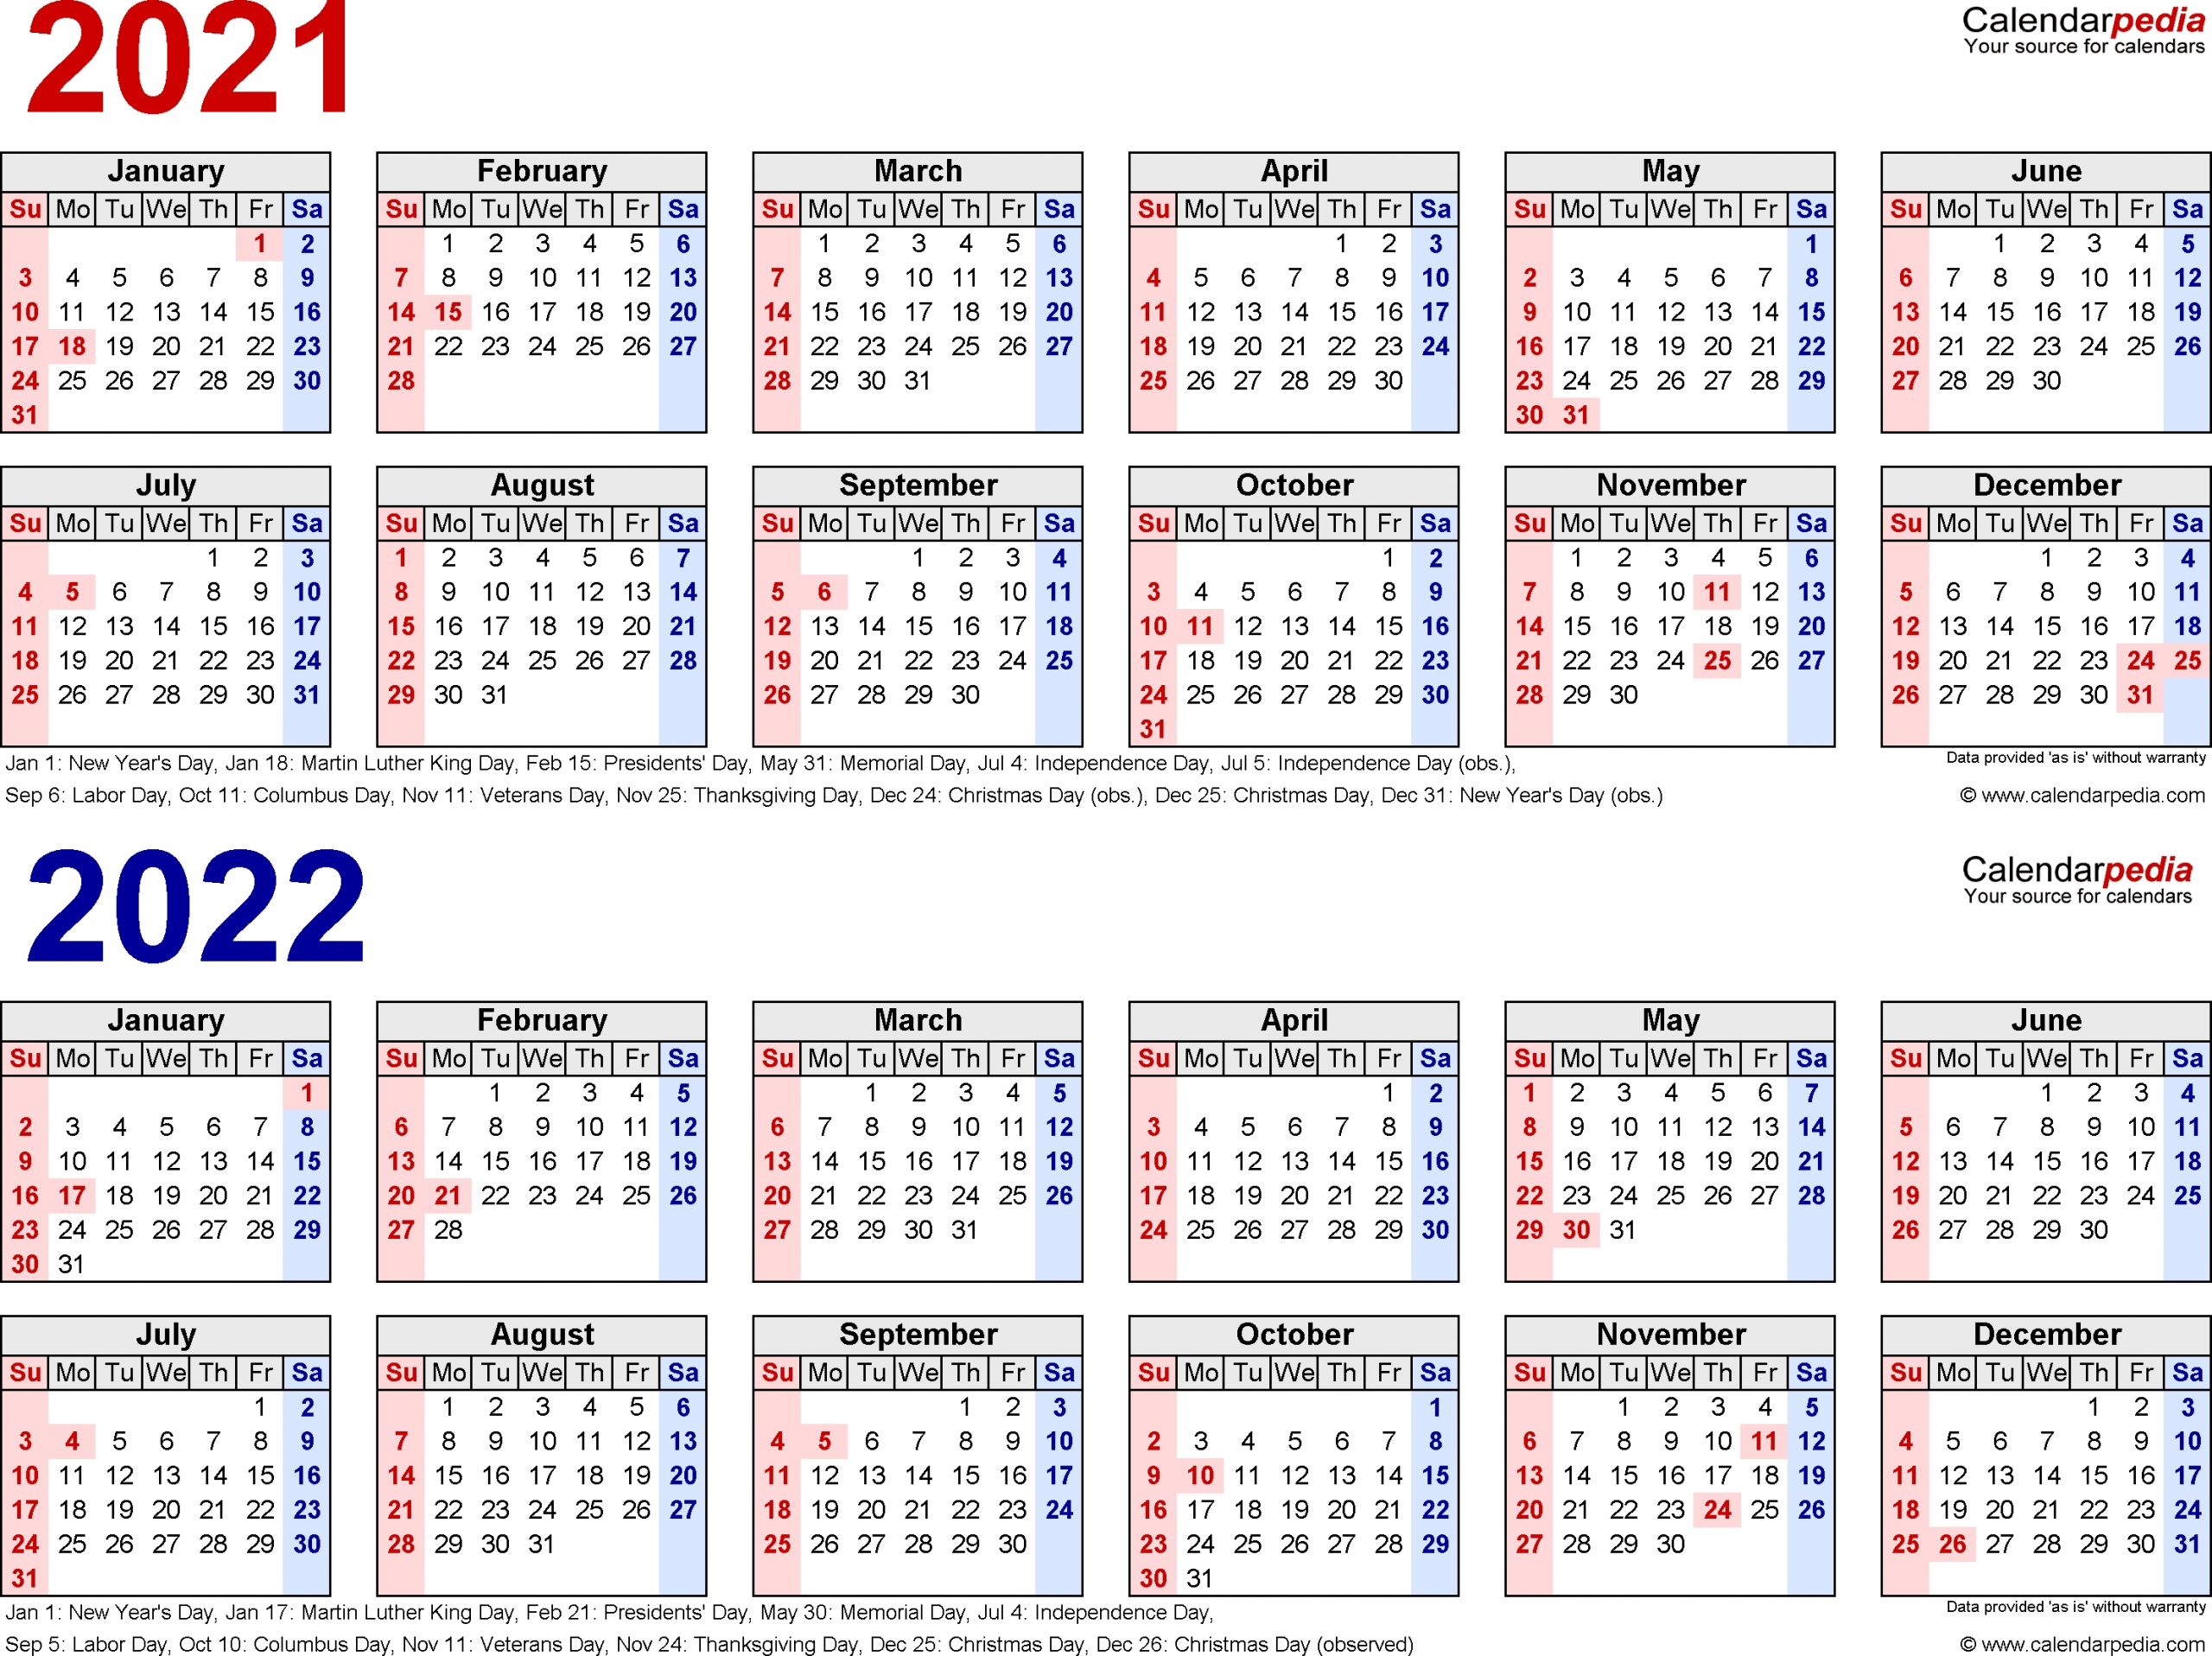 Printable 3 Year Il Caemdar 2020 2022 | Example Calendar